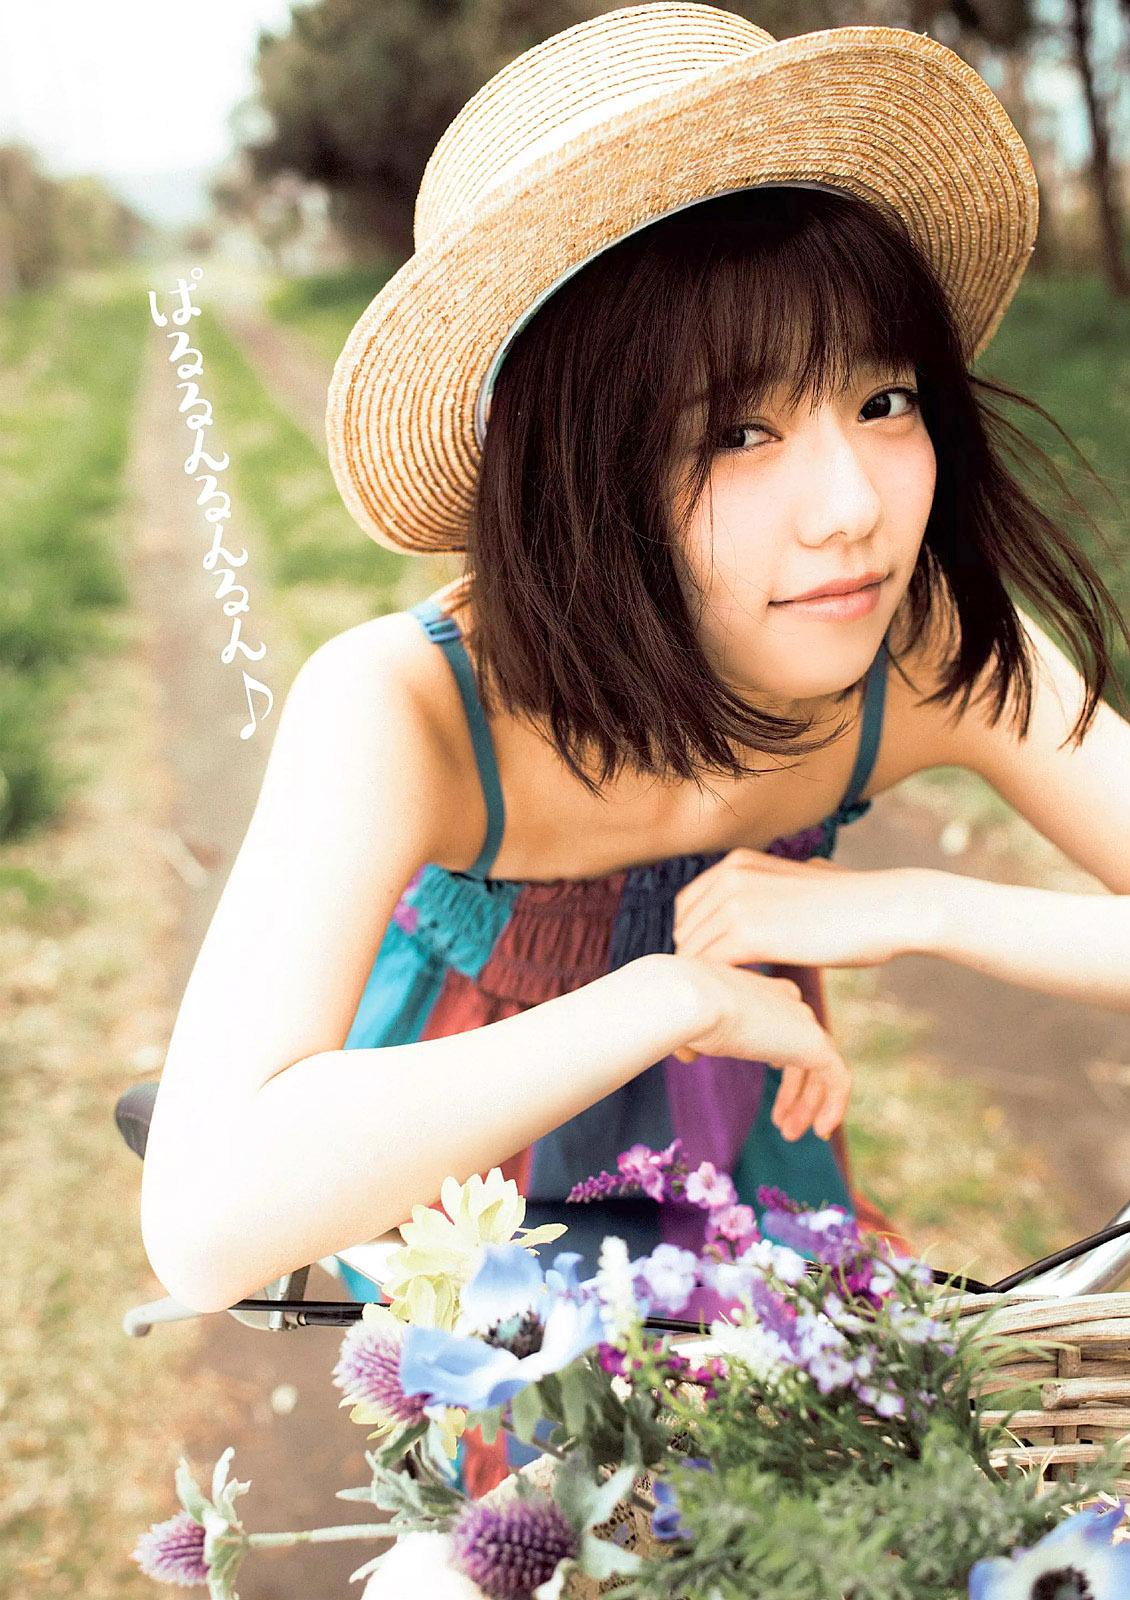 HShimazaki WPB 150615 02.jpg